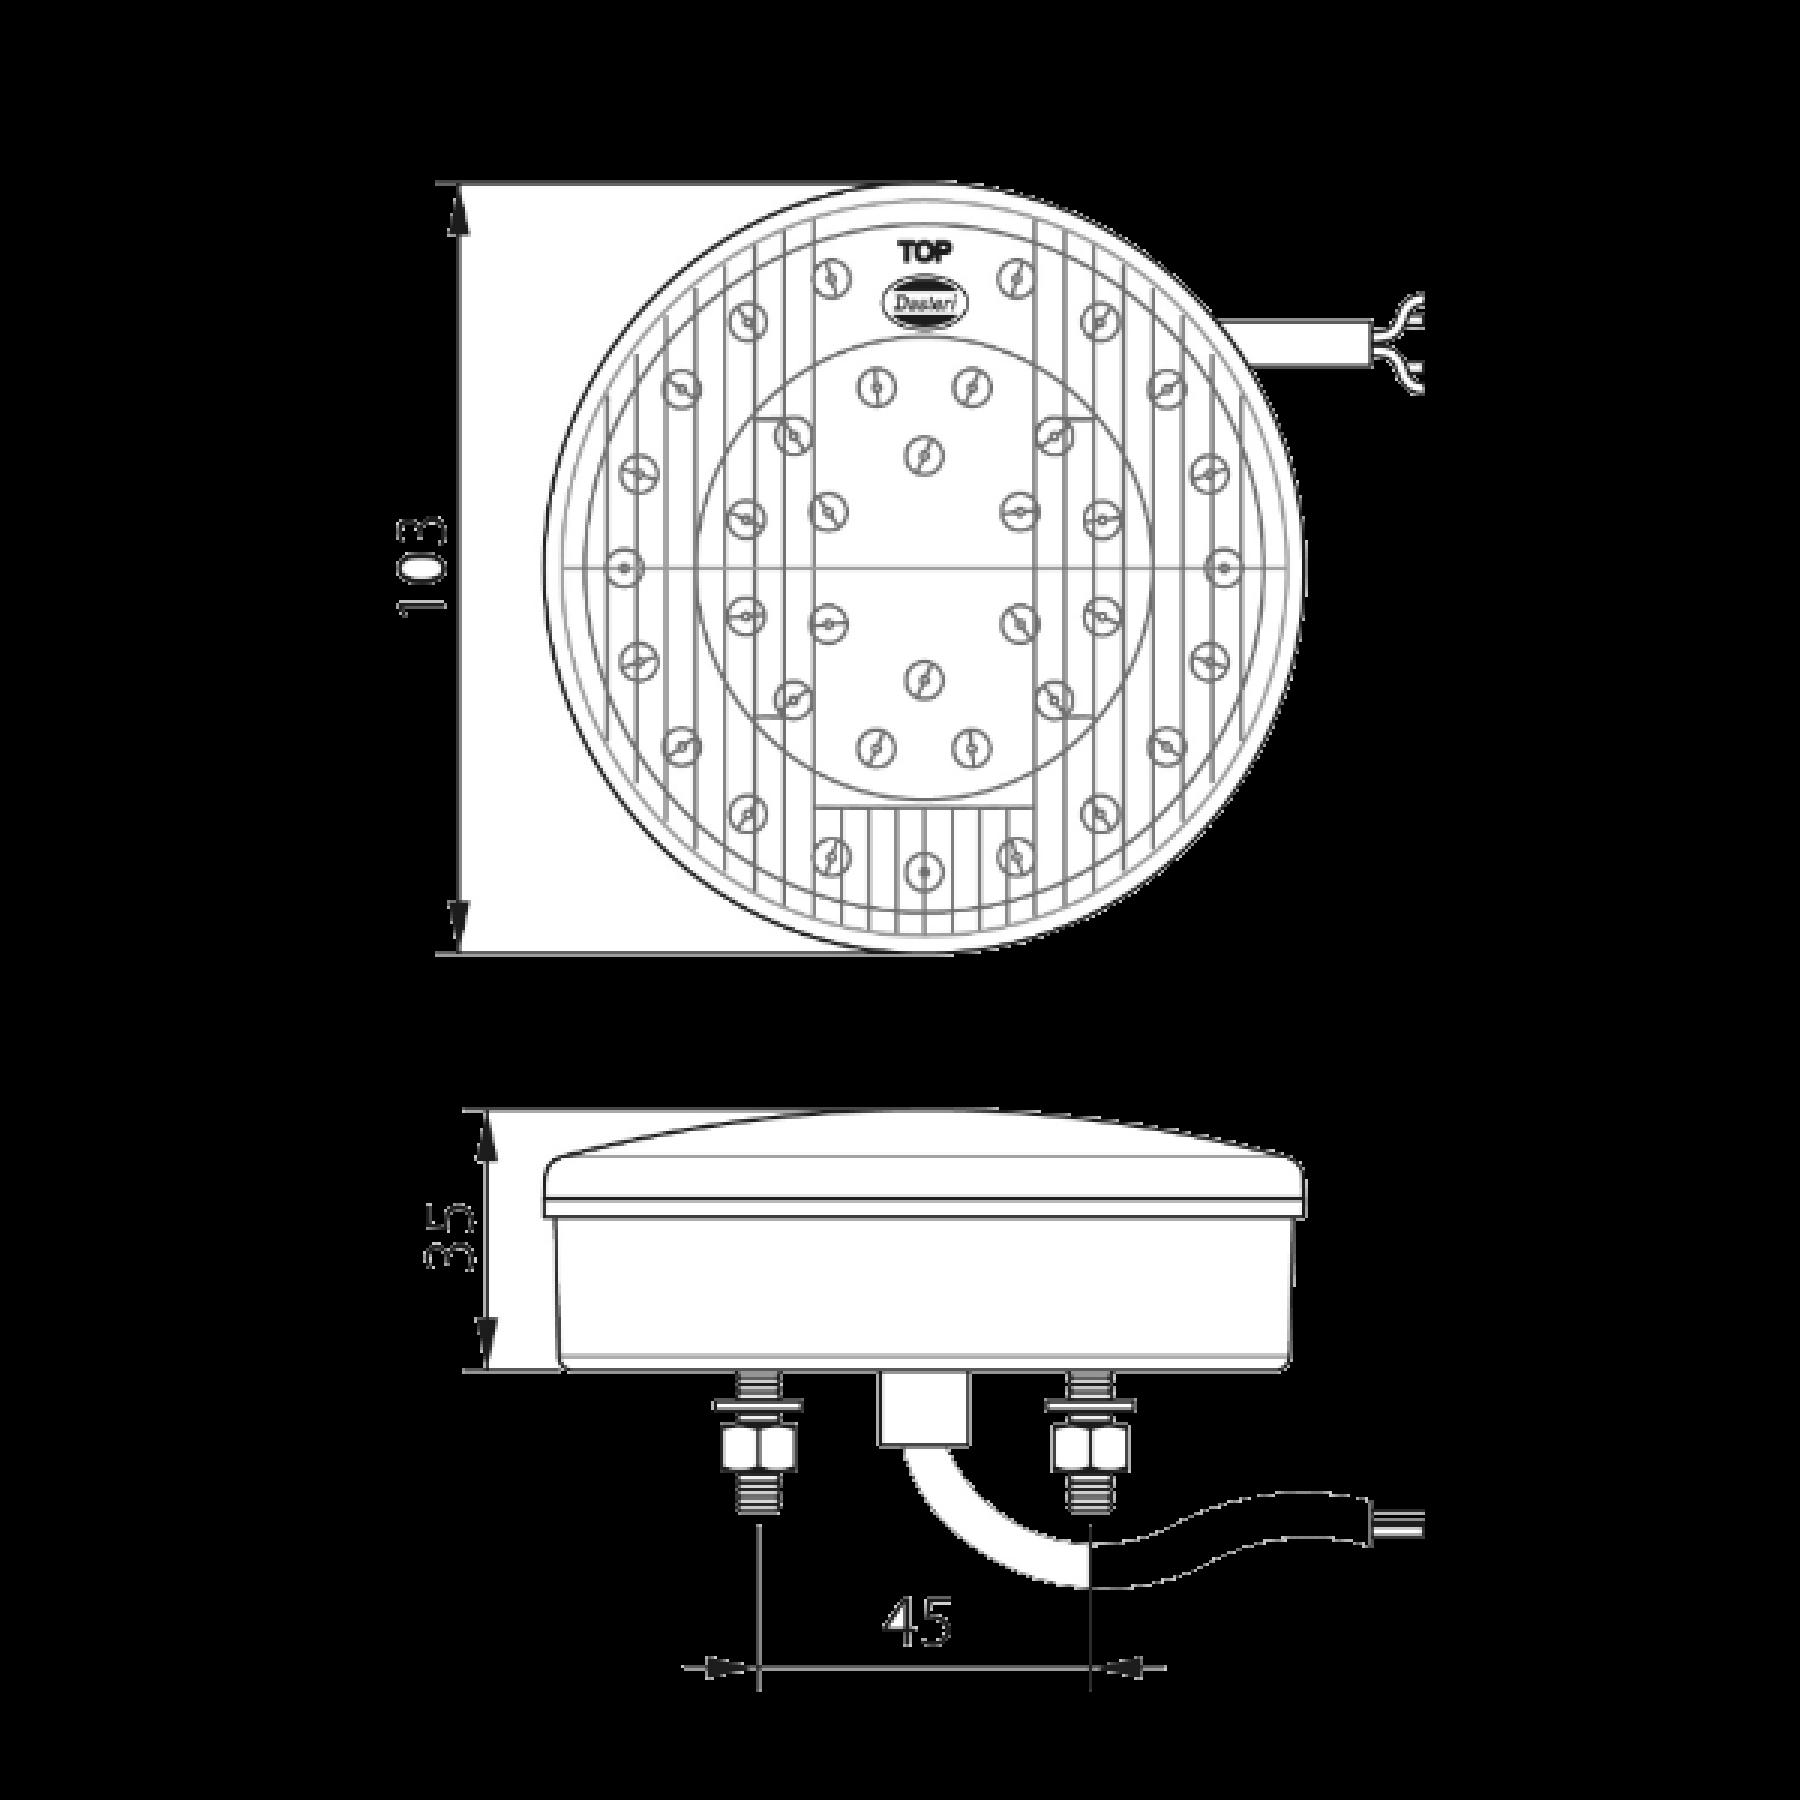 Achterlicht LED rond Ø 103mm 3 functies 12v